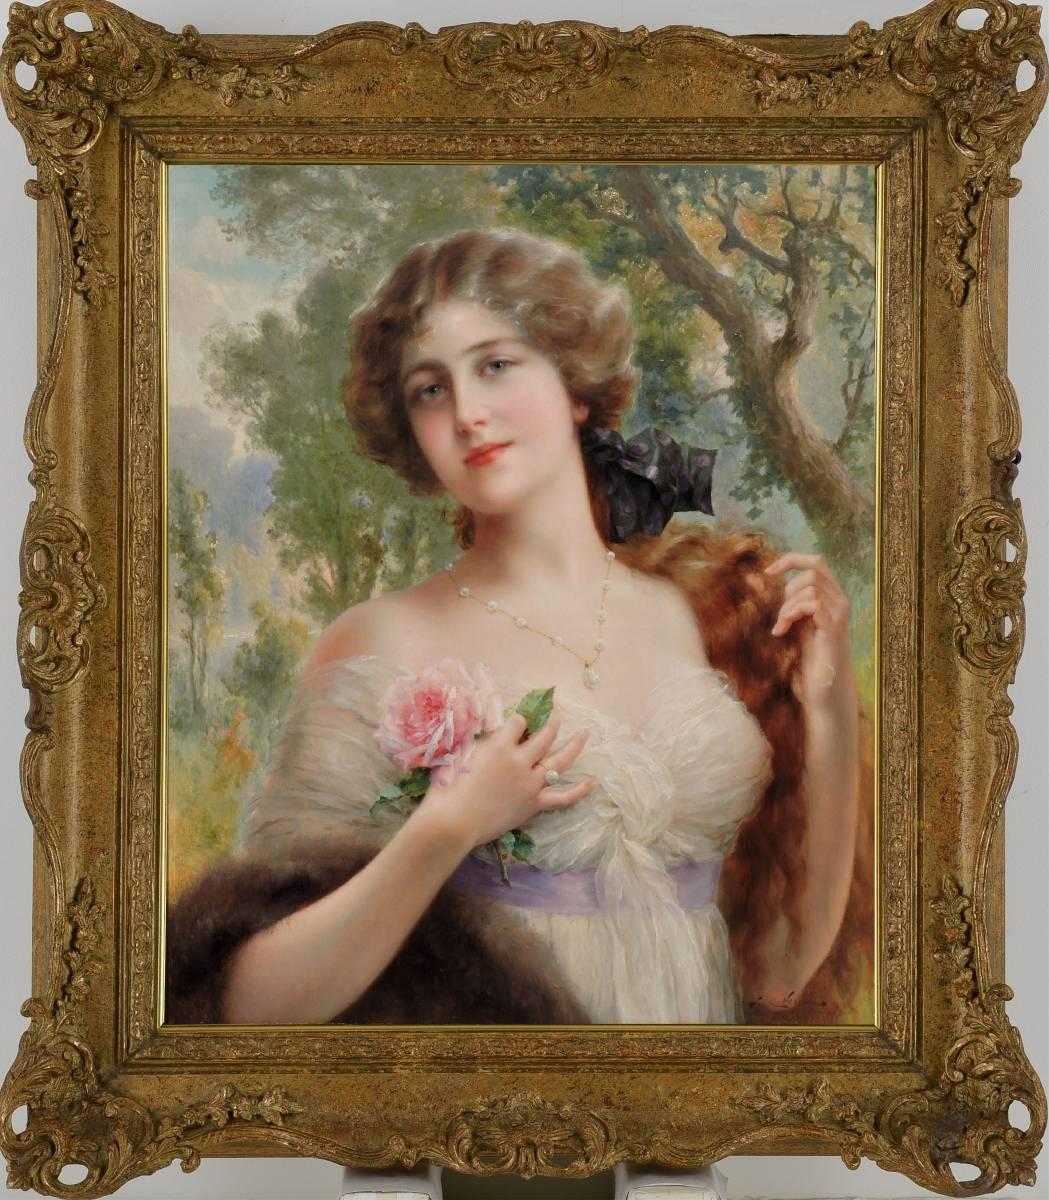 【H】19世紀仏巨匠「E.バーノン」師W.ブグロー/Artworks掲載作品、Wiki掲載作品!15号